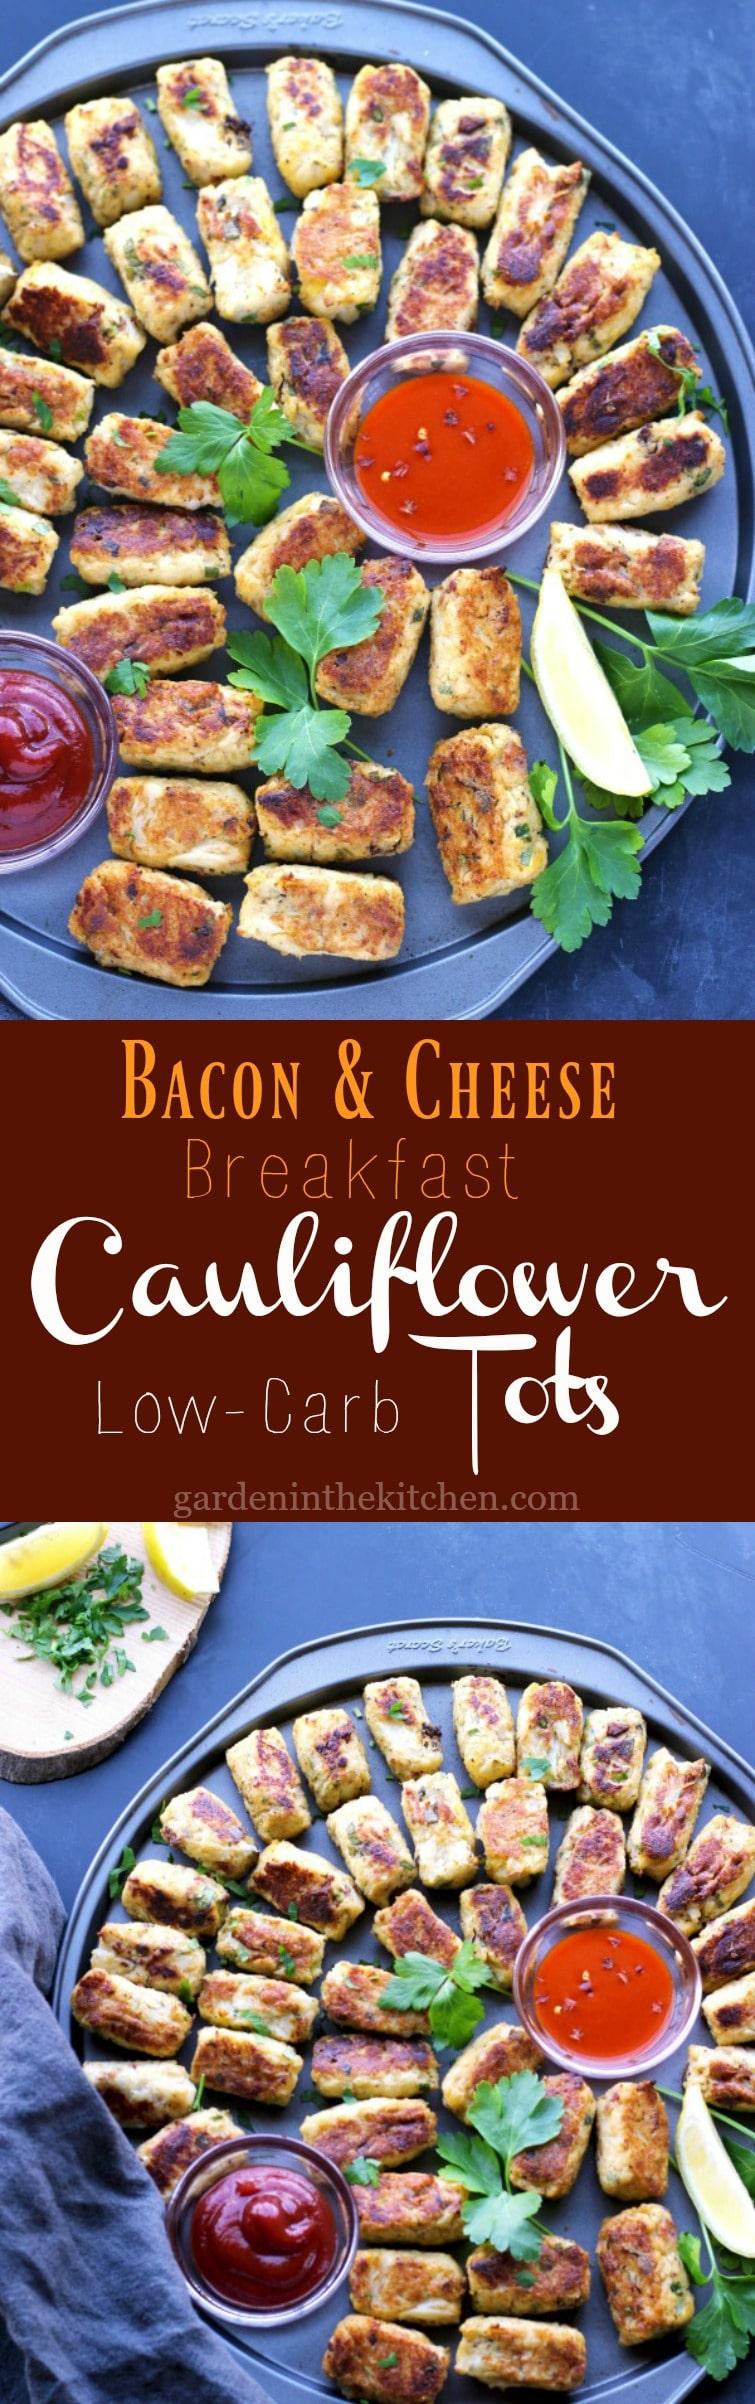 Bacon & Cheese Cauliflower Tots